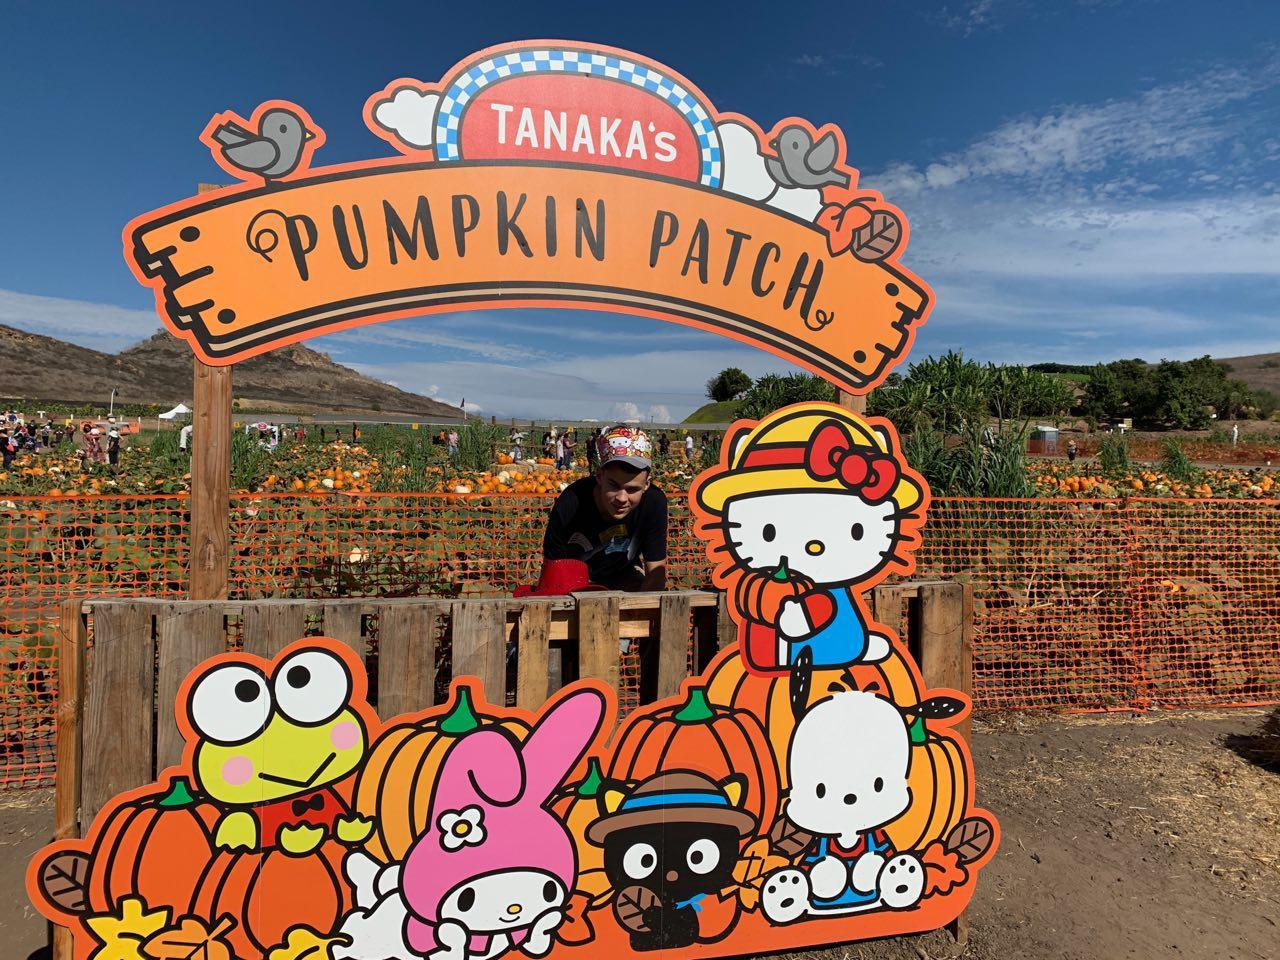 Tanaka's Pumpkin Patch